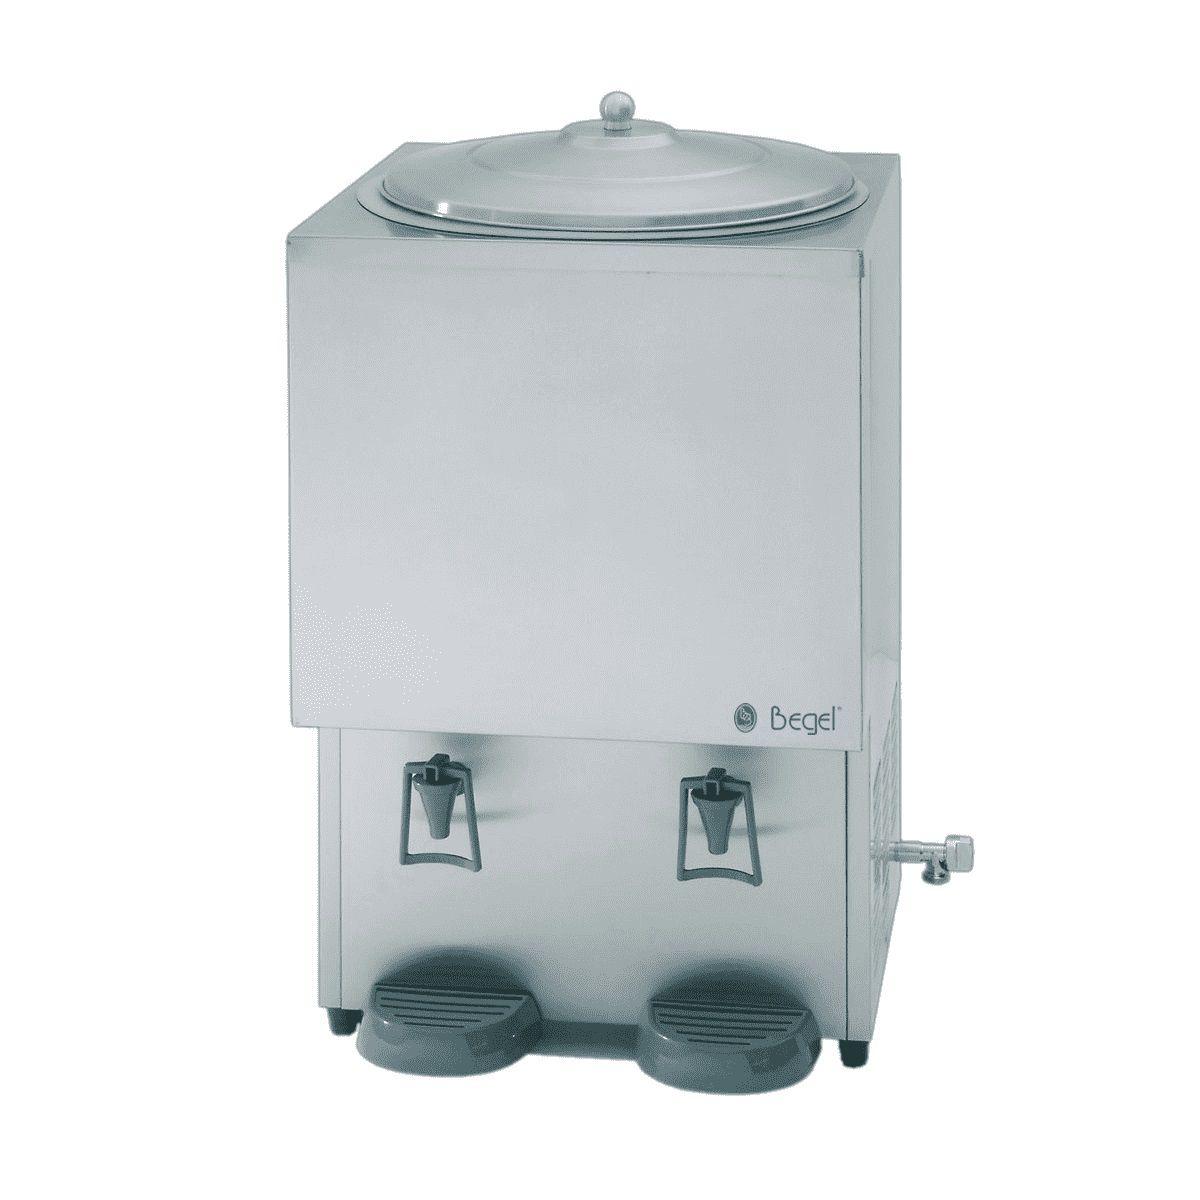 Refresqueira Industrial Begel 50 Litros - RFI50